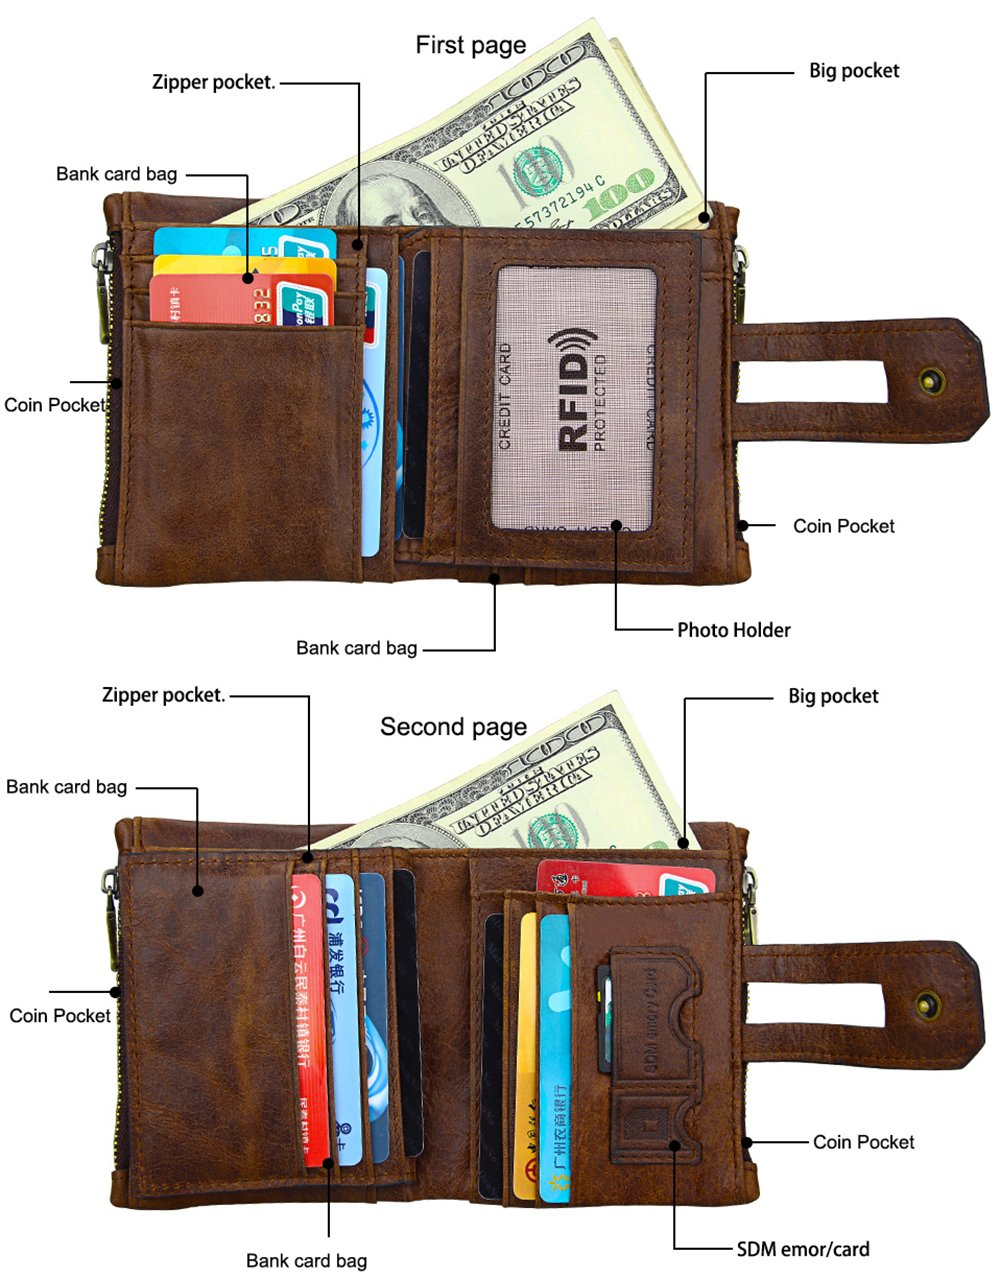 iSuperb Men's RFID Blocking Wallet Bifold Short Purse Multi Card Organizer with Double Zipper (Coffee) by iSuperb (Image #4)